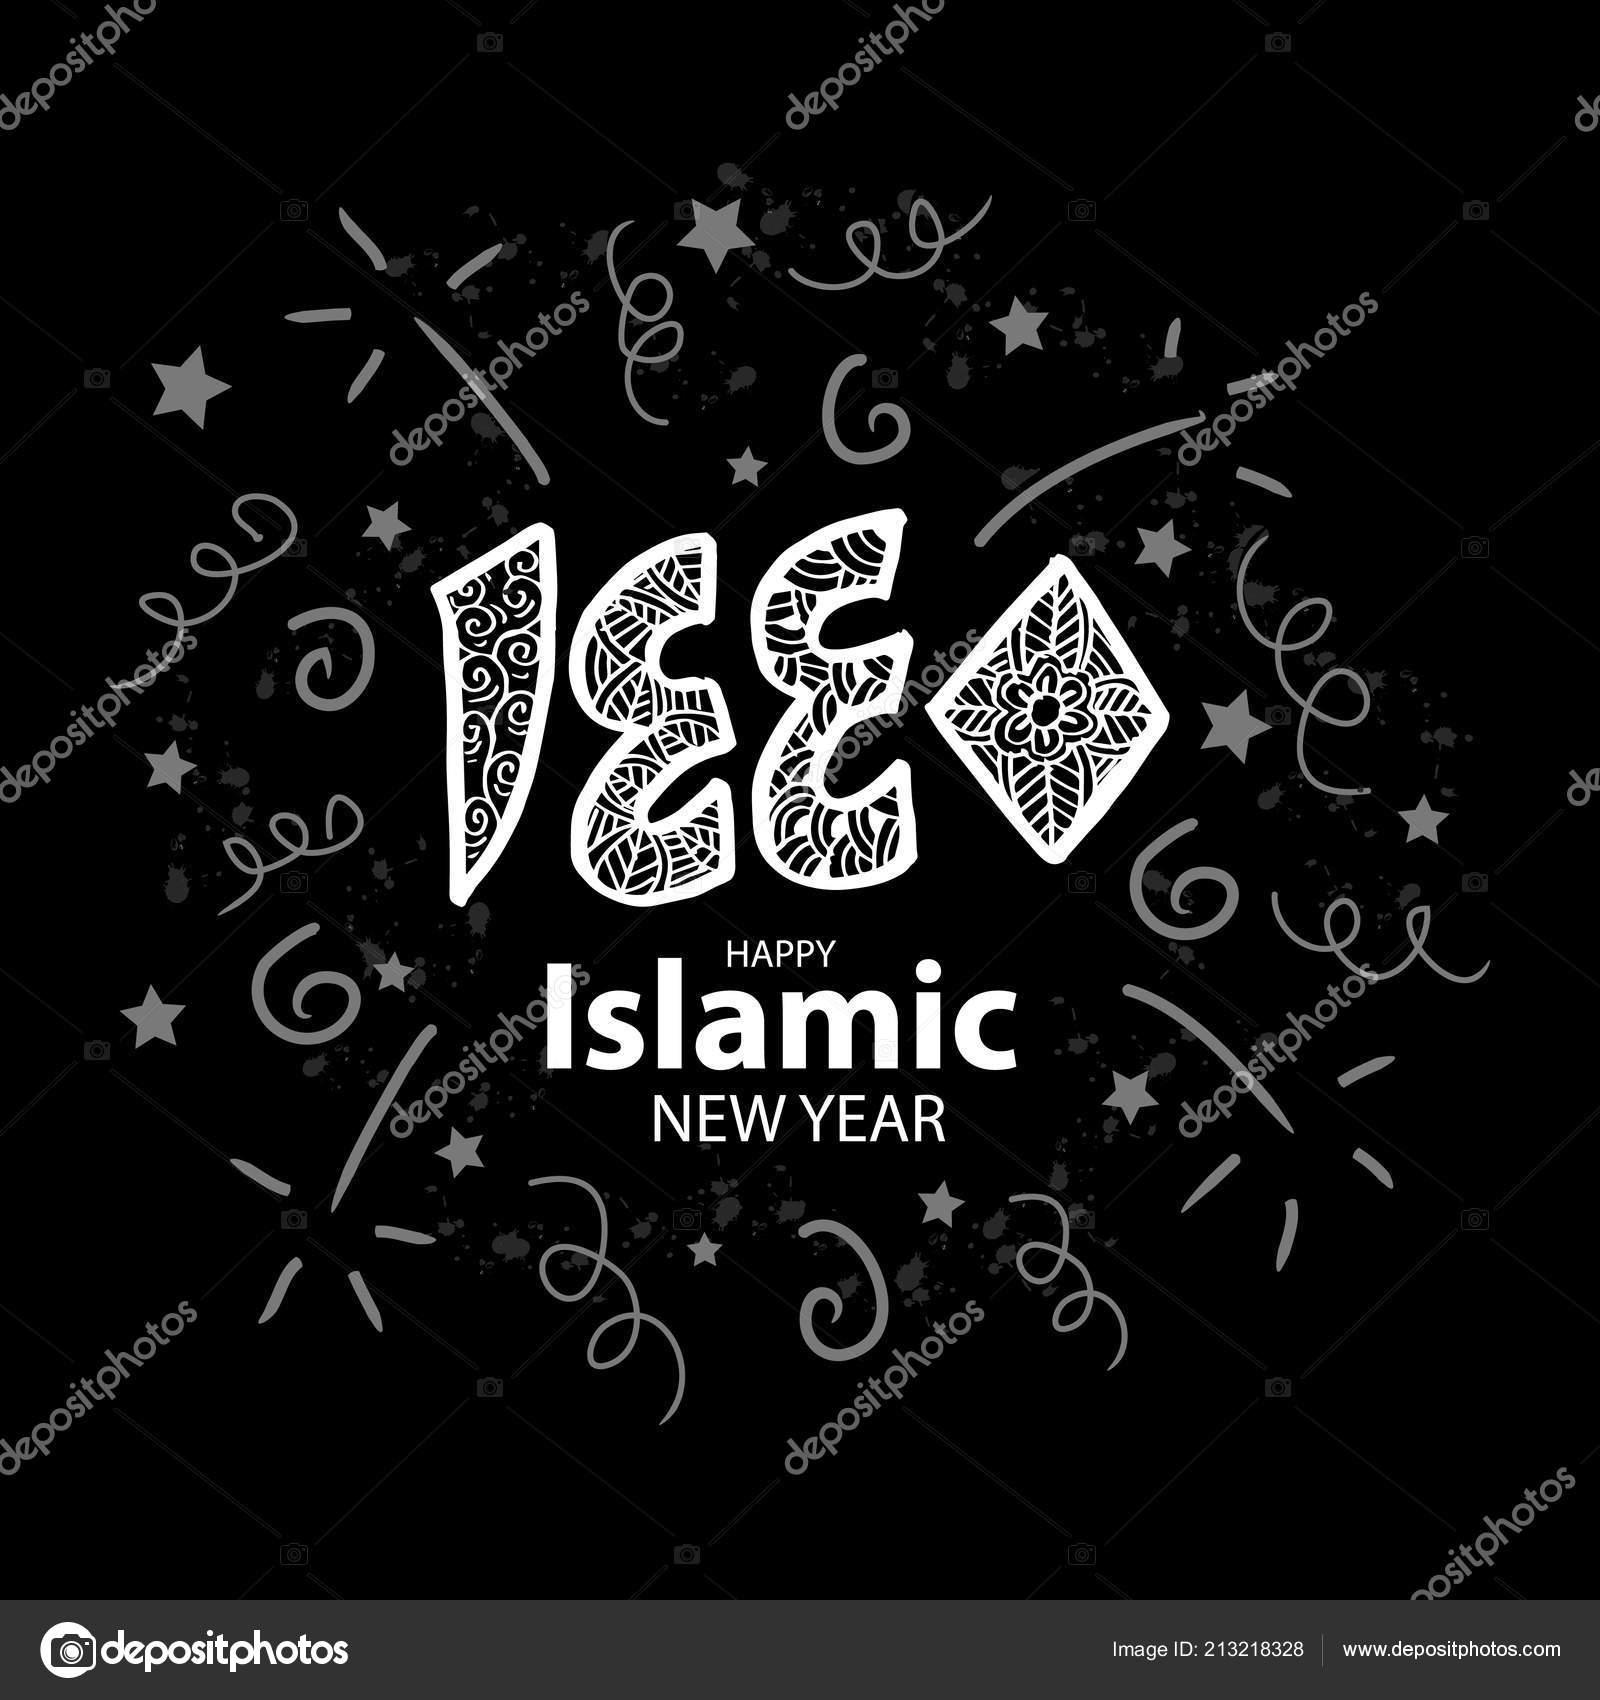 Happy Islamic New Year Greeting Card Handini